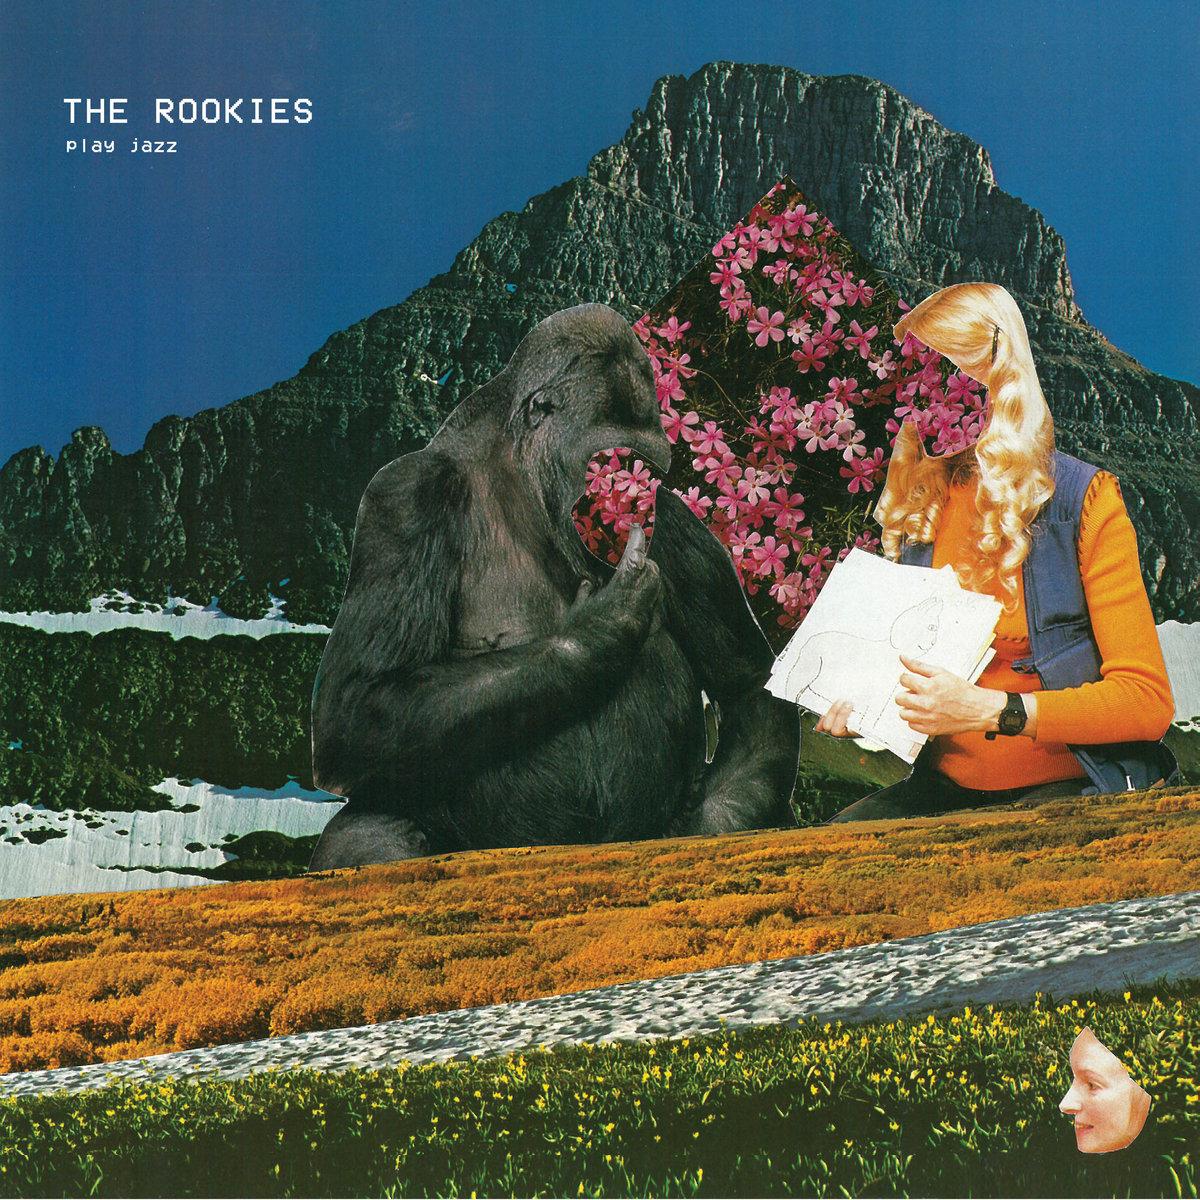 The Rookies - Play Jazz